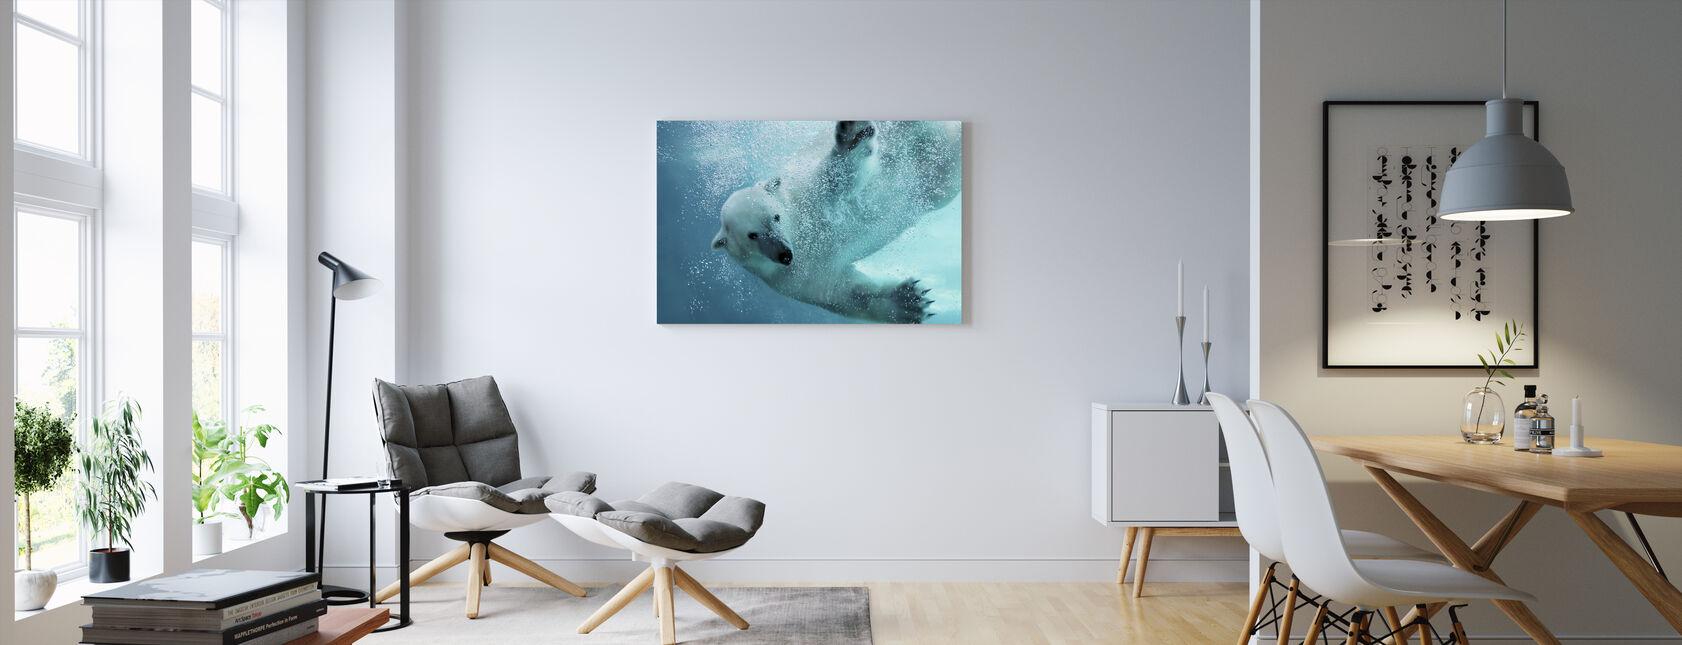 Underwater Polar Bear - Canvas print - Living Room